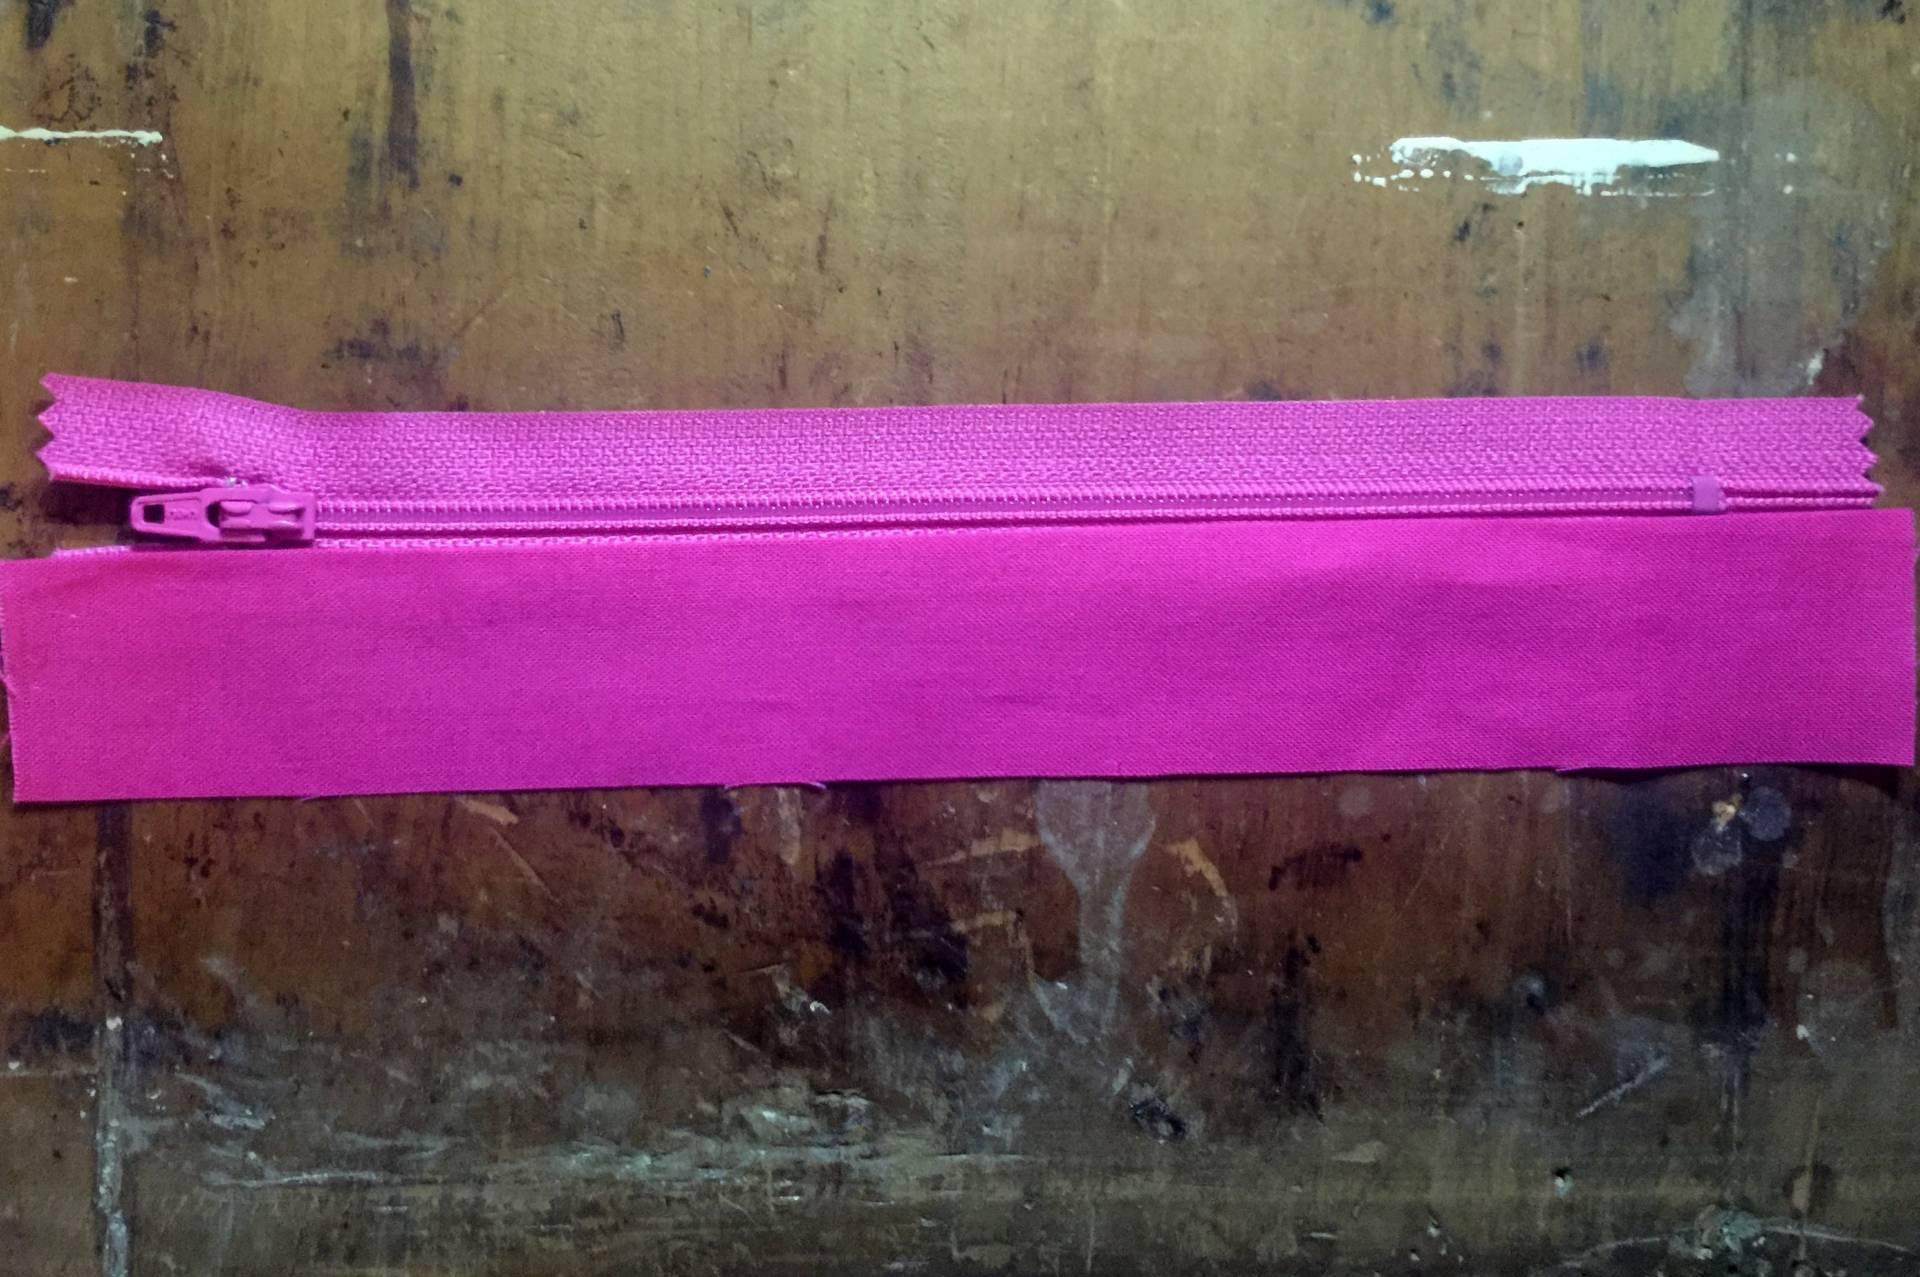 Vinyl Zip Pouch tutorial, preparing the zipper